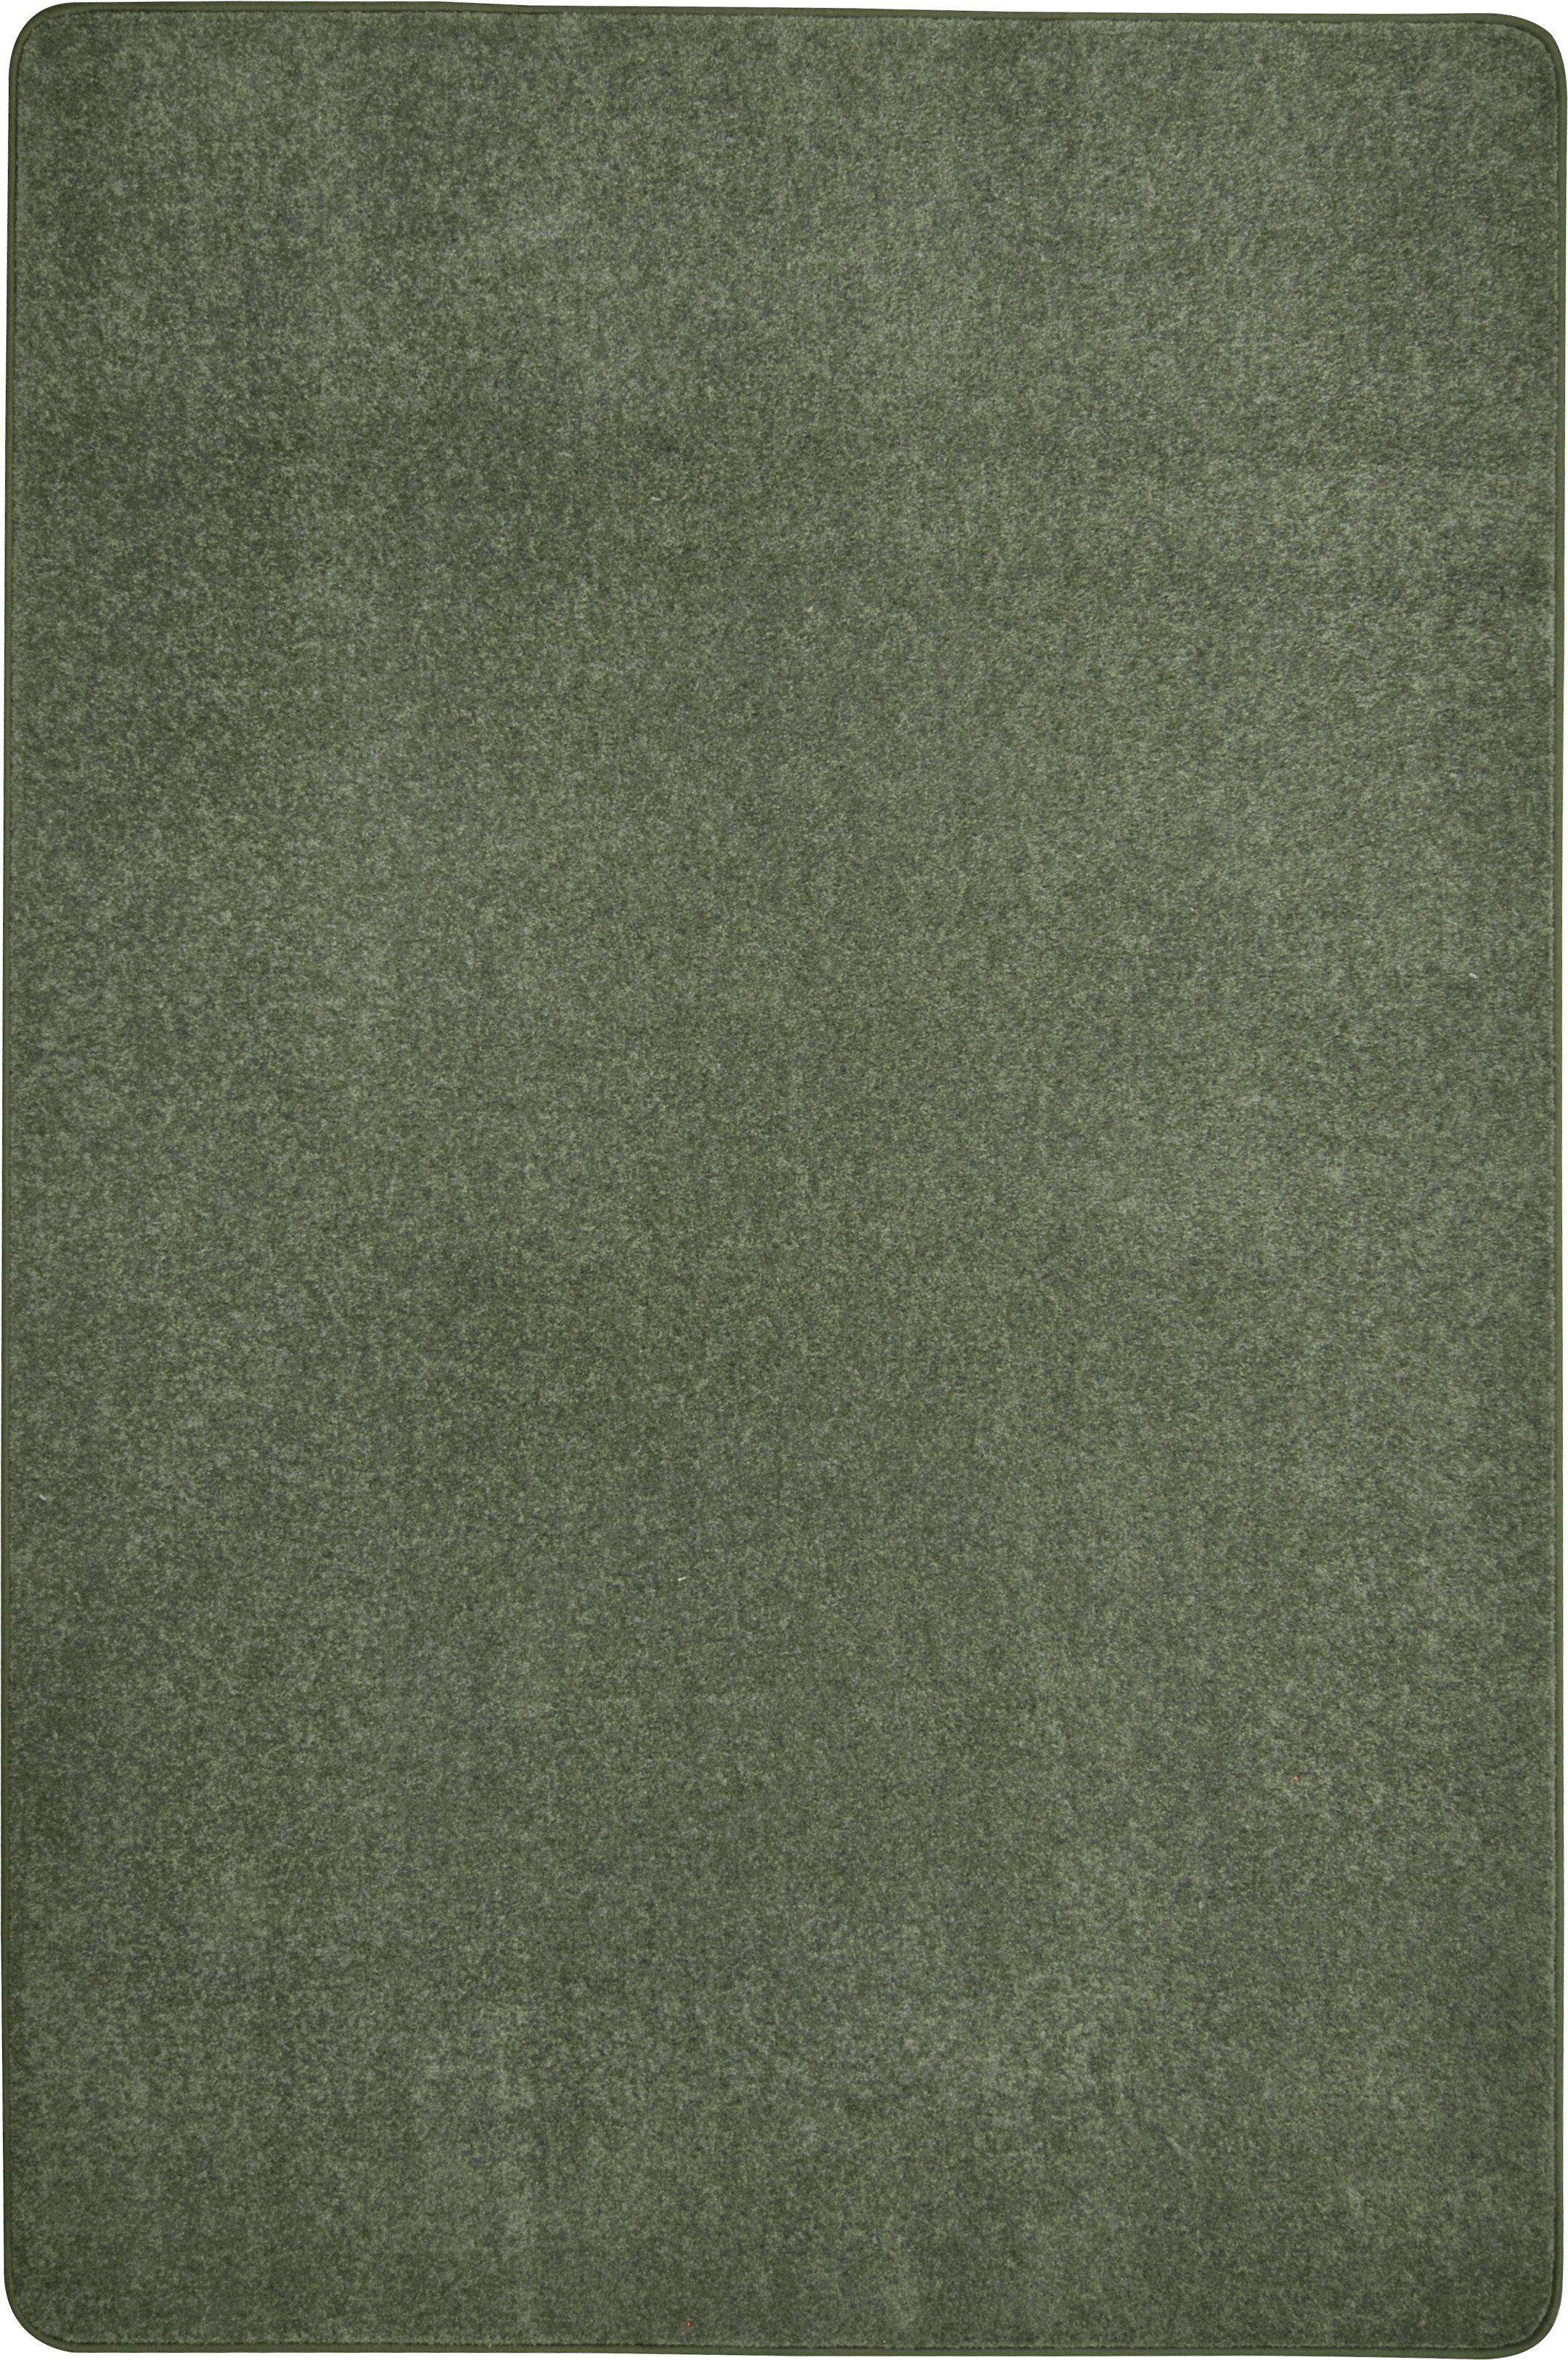 Endurance Green Area Rug Rug Size: Rectangle 12' x 12'